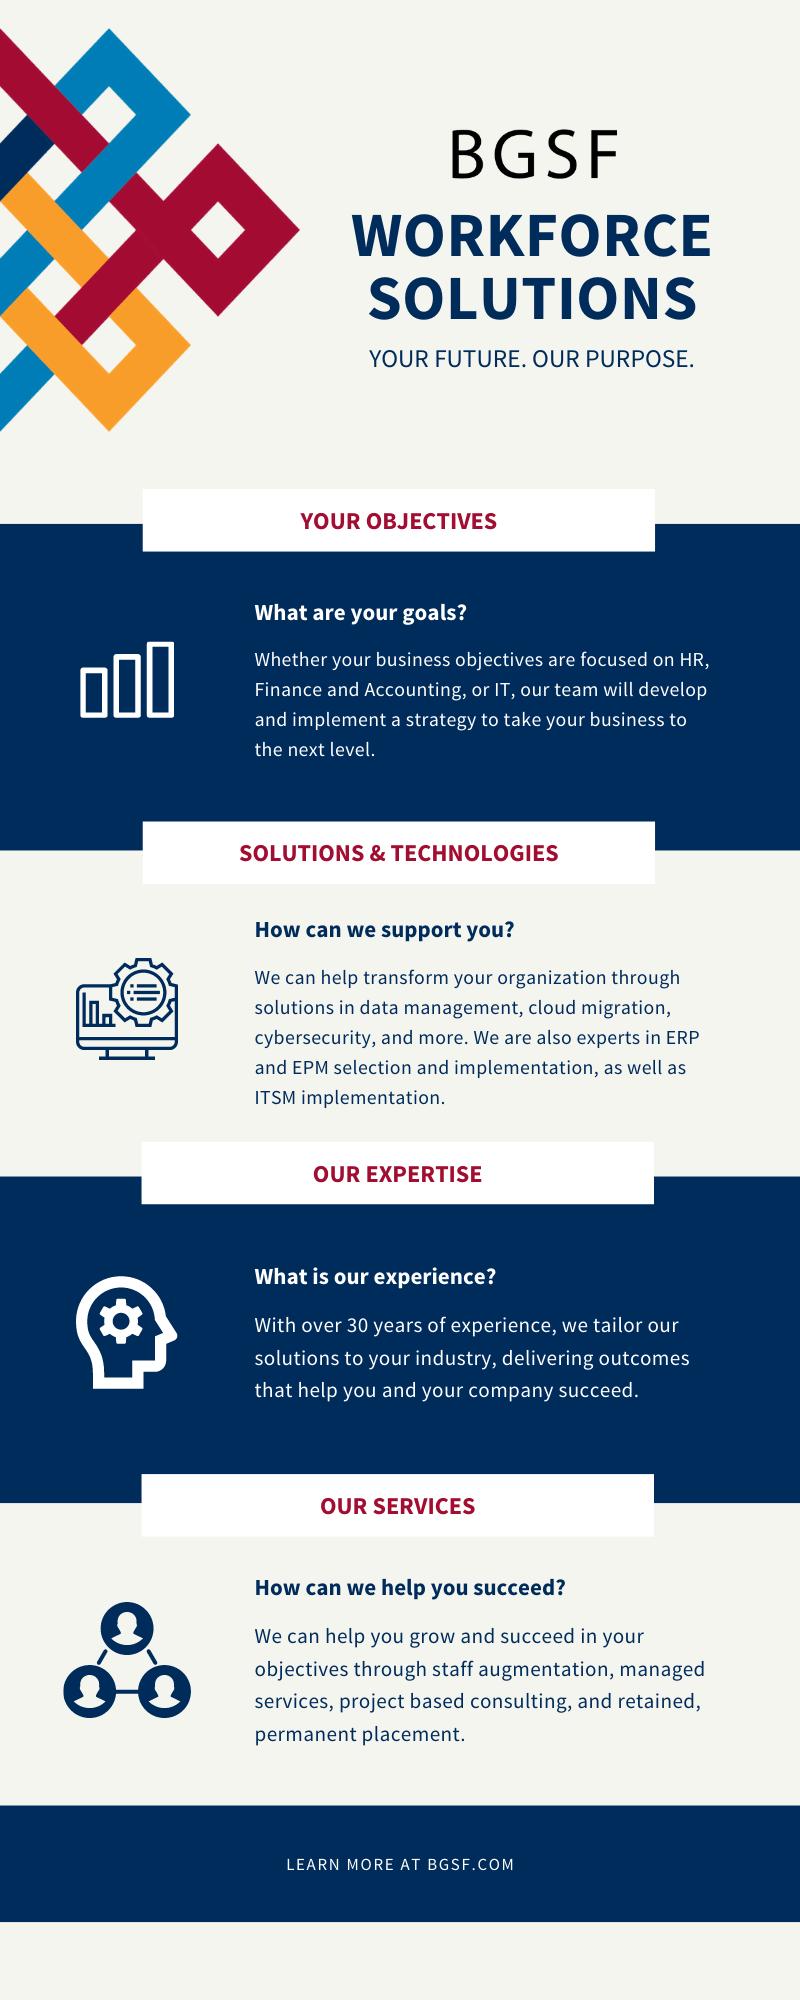 BGSF Workforce Solutions